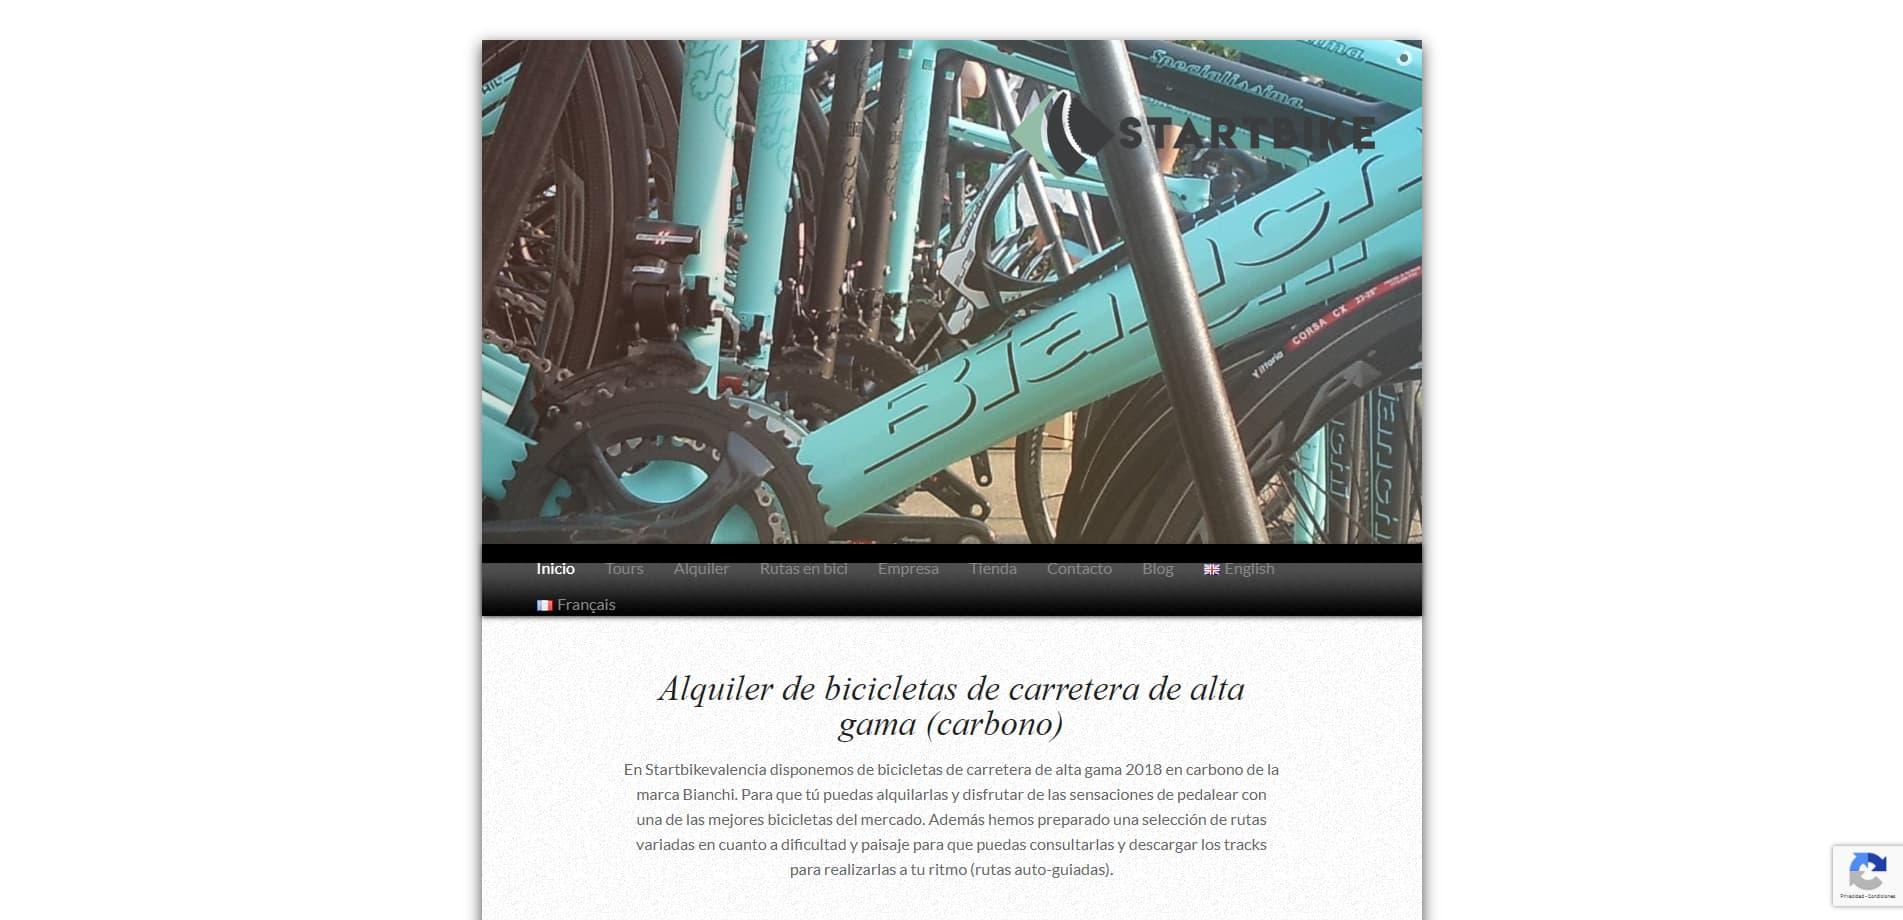 Startbikevalencia - Alquiler Bicicicletas Valencia